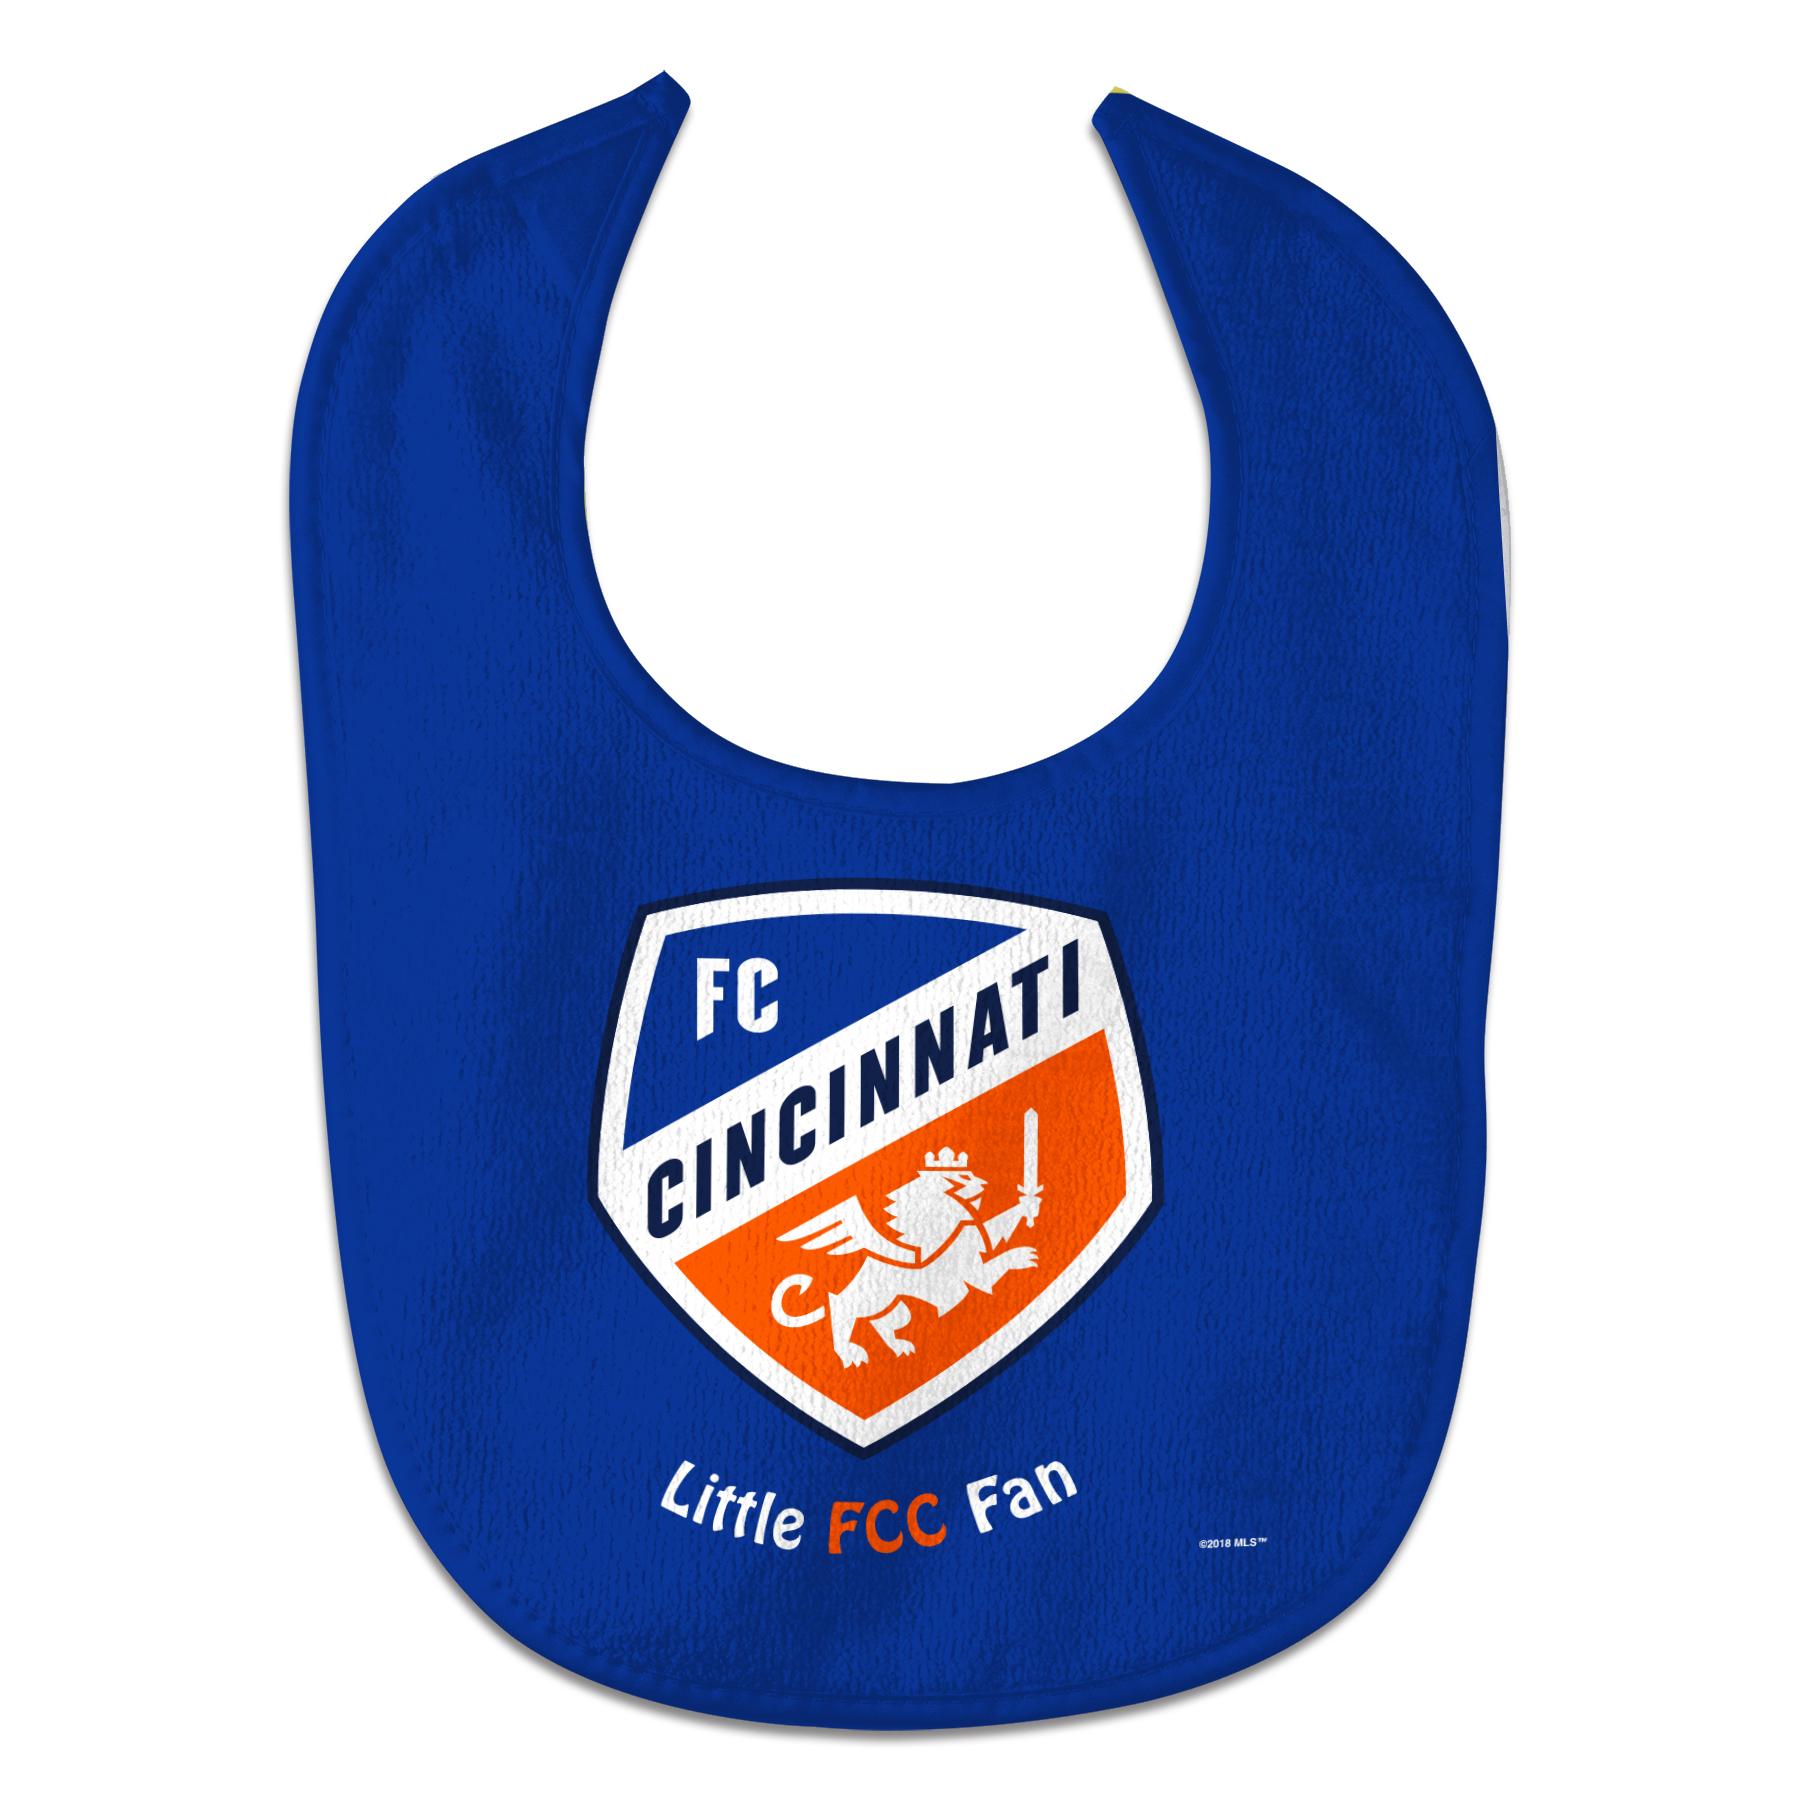 FC Cincinnati WinCraft All-Pro Baby Bib - No Size